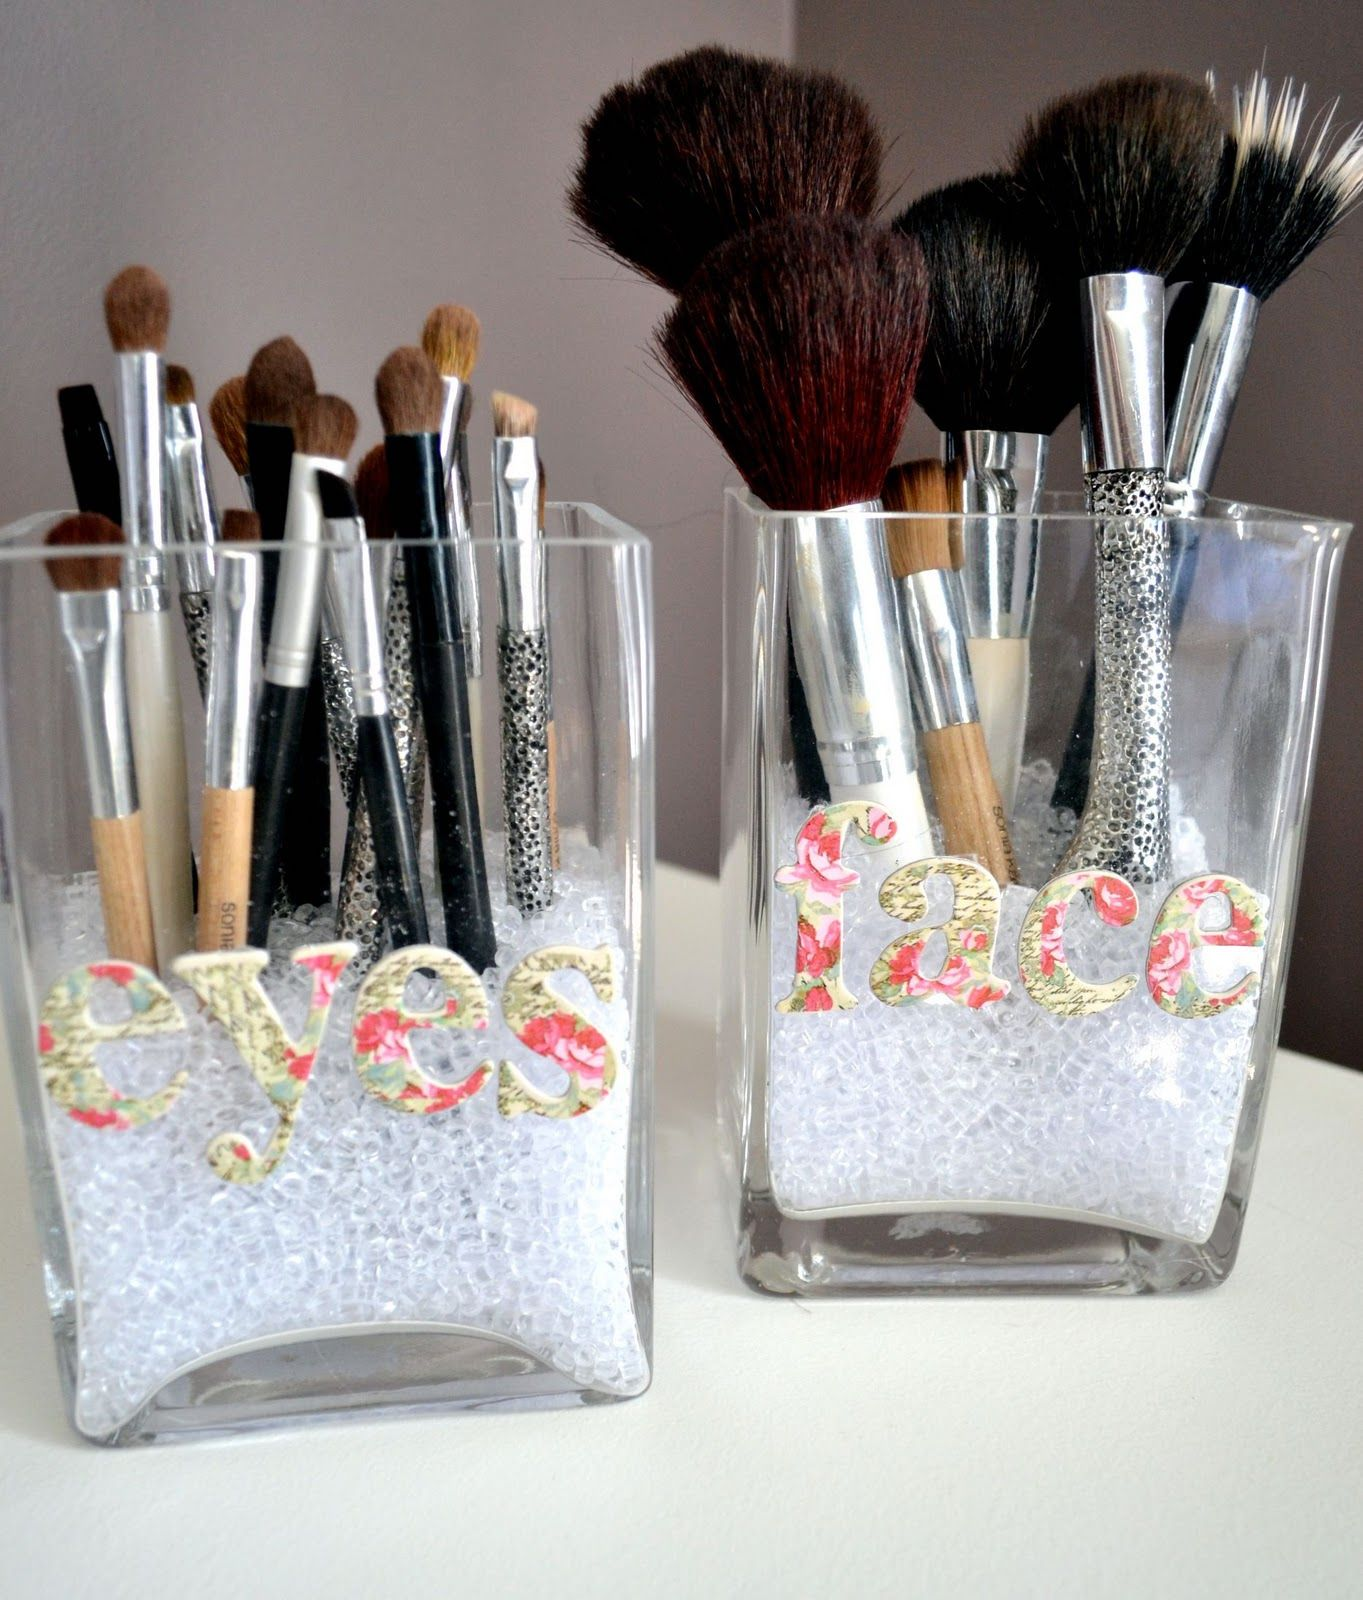 Make Up Brush Storage. Two Jars (I Chose A Square Shape), Letter